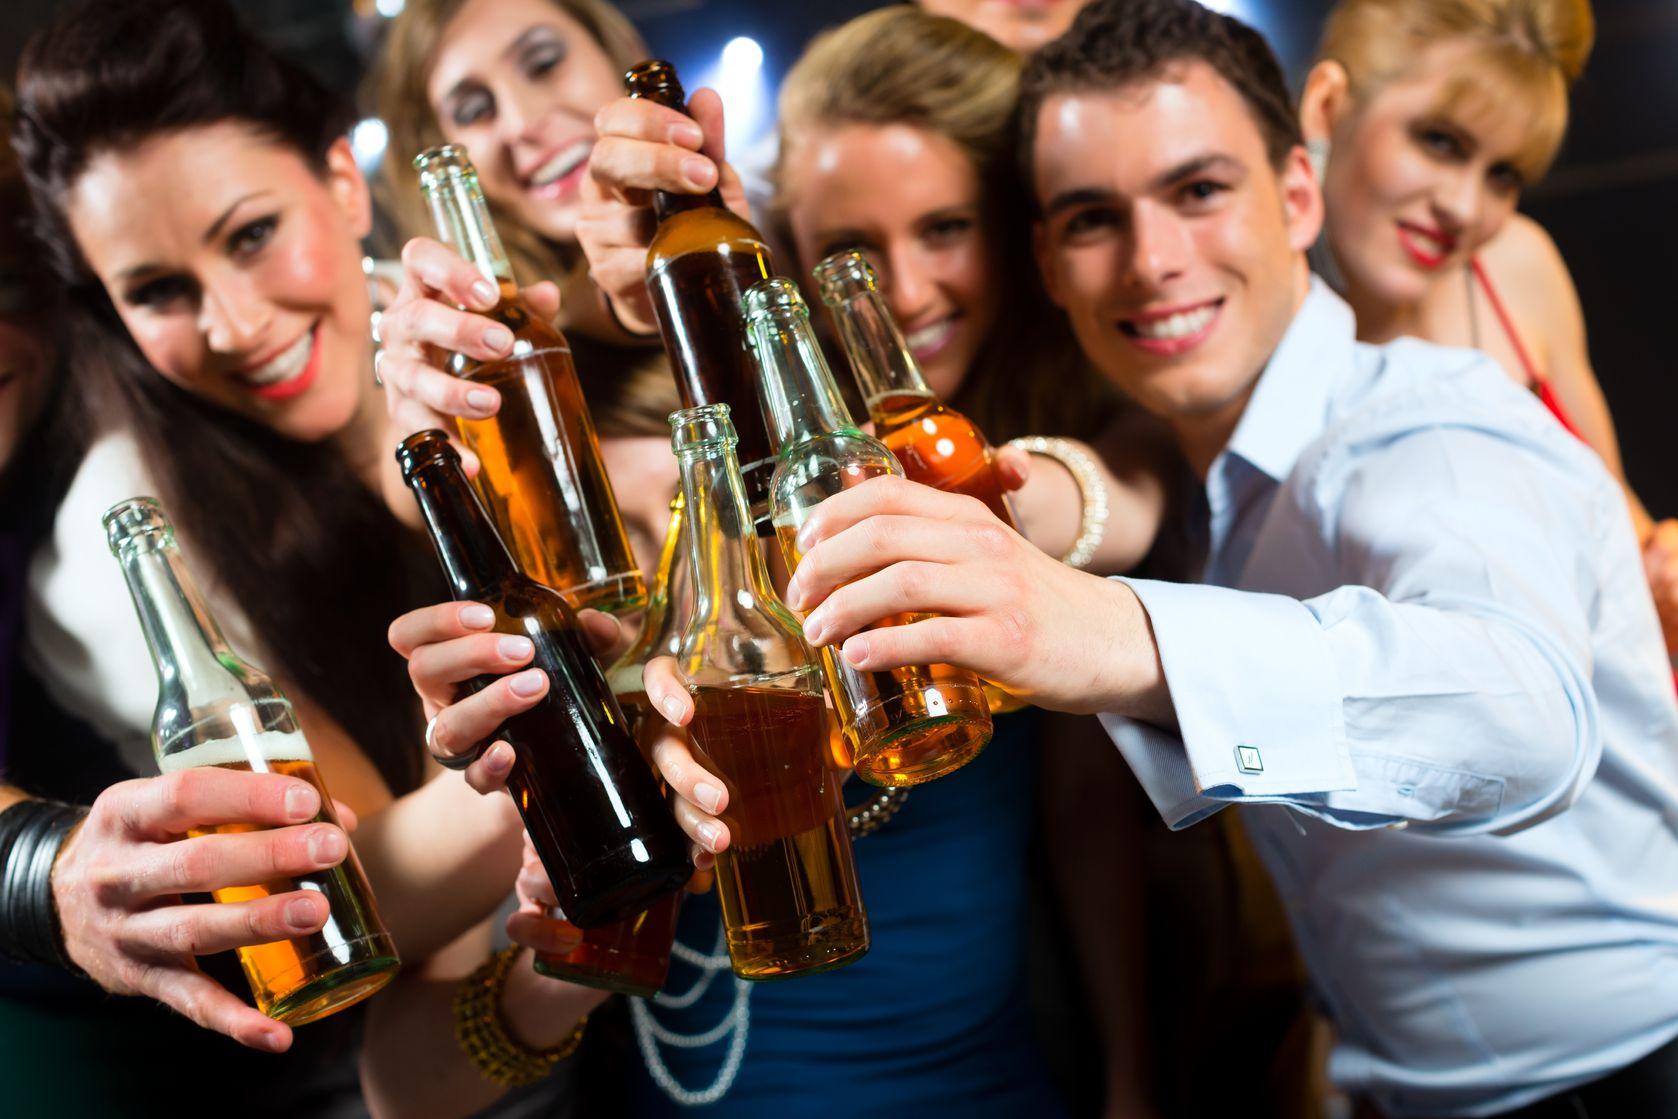 Group Of People Having Fun In Busy Bar Stock Photo - Image ...  |People Having Fun In A Club